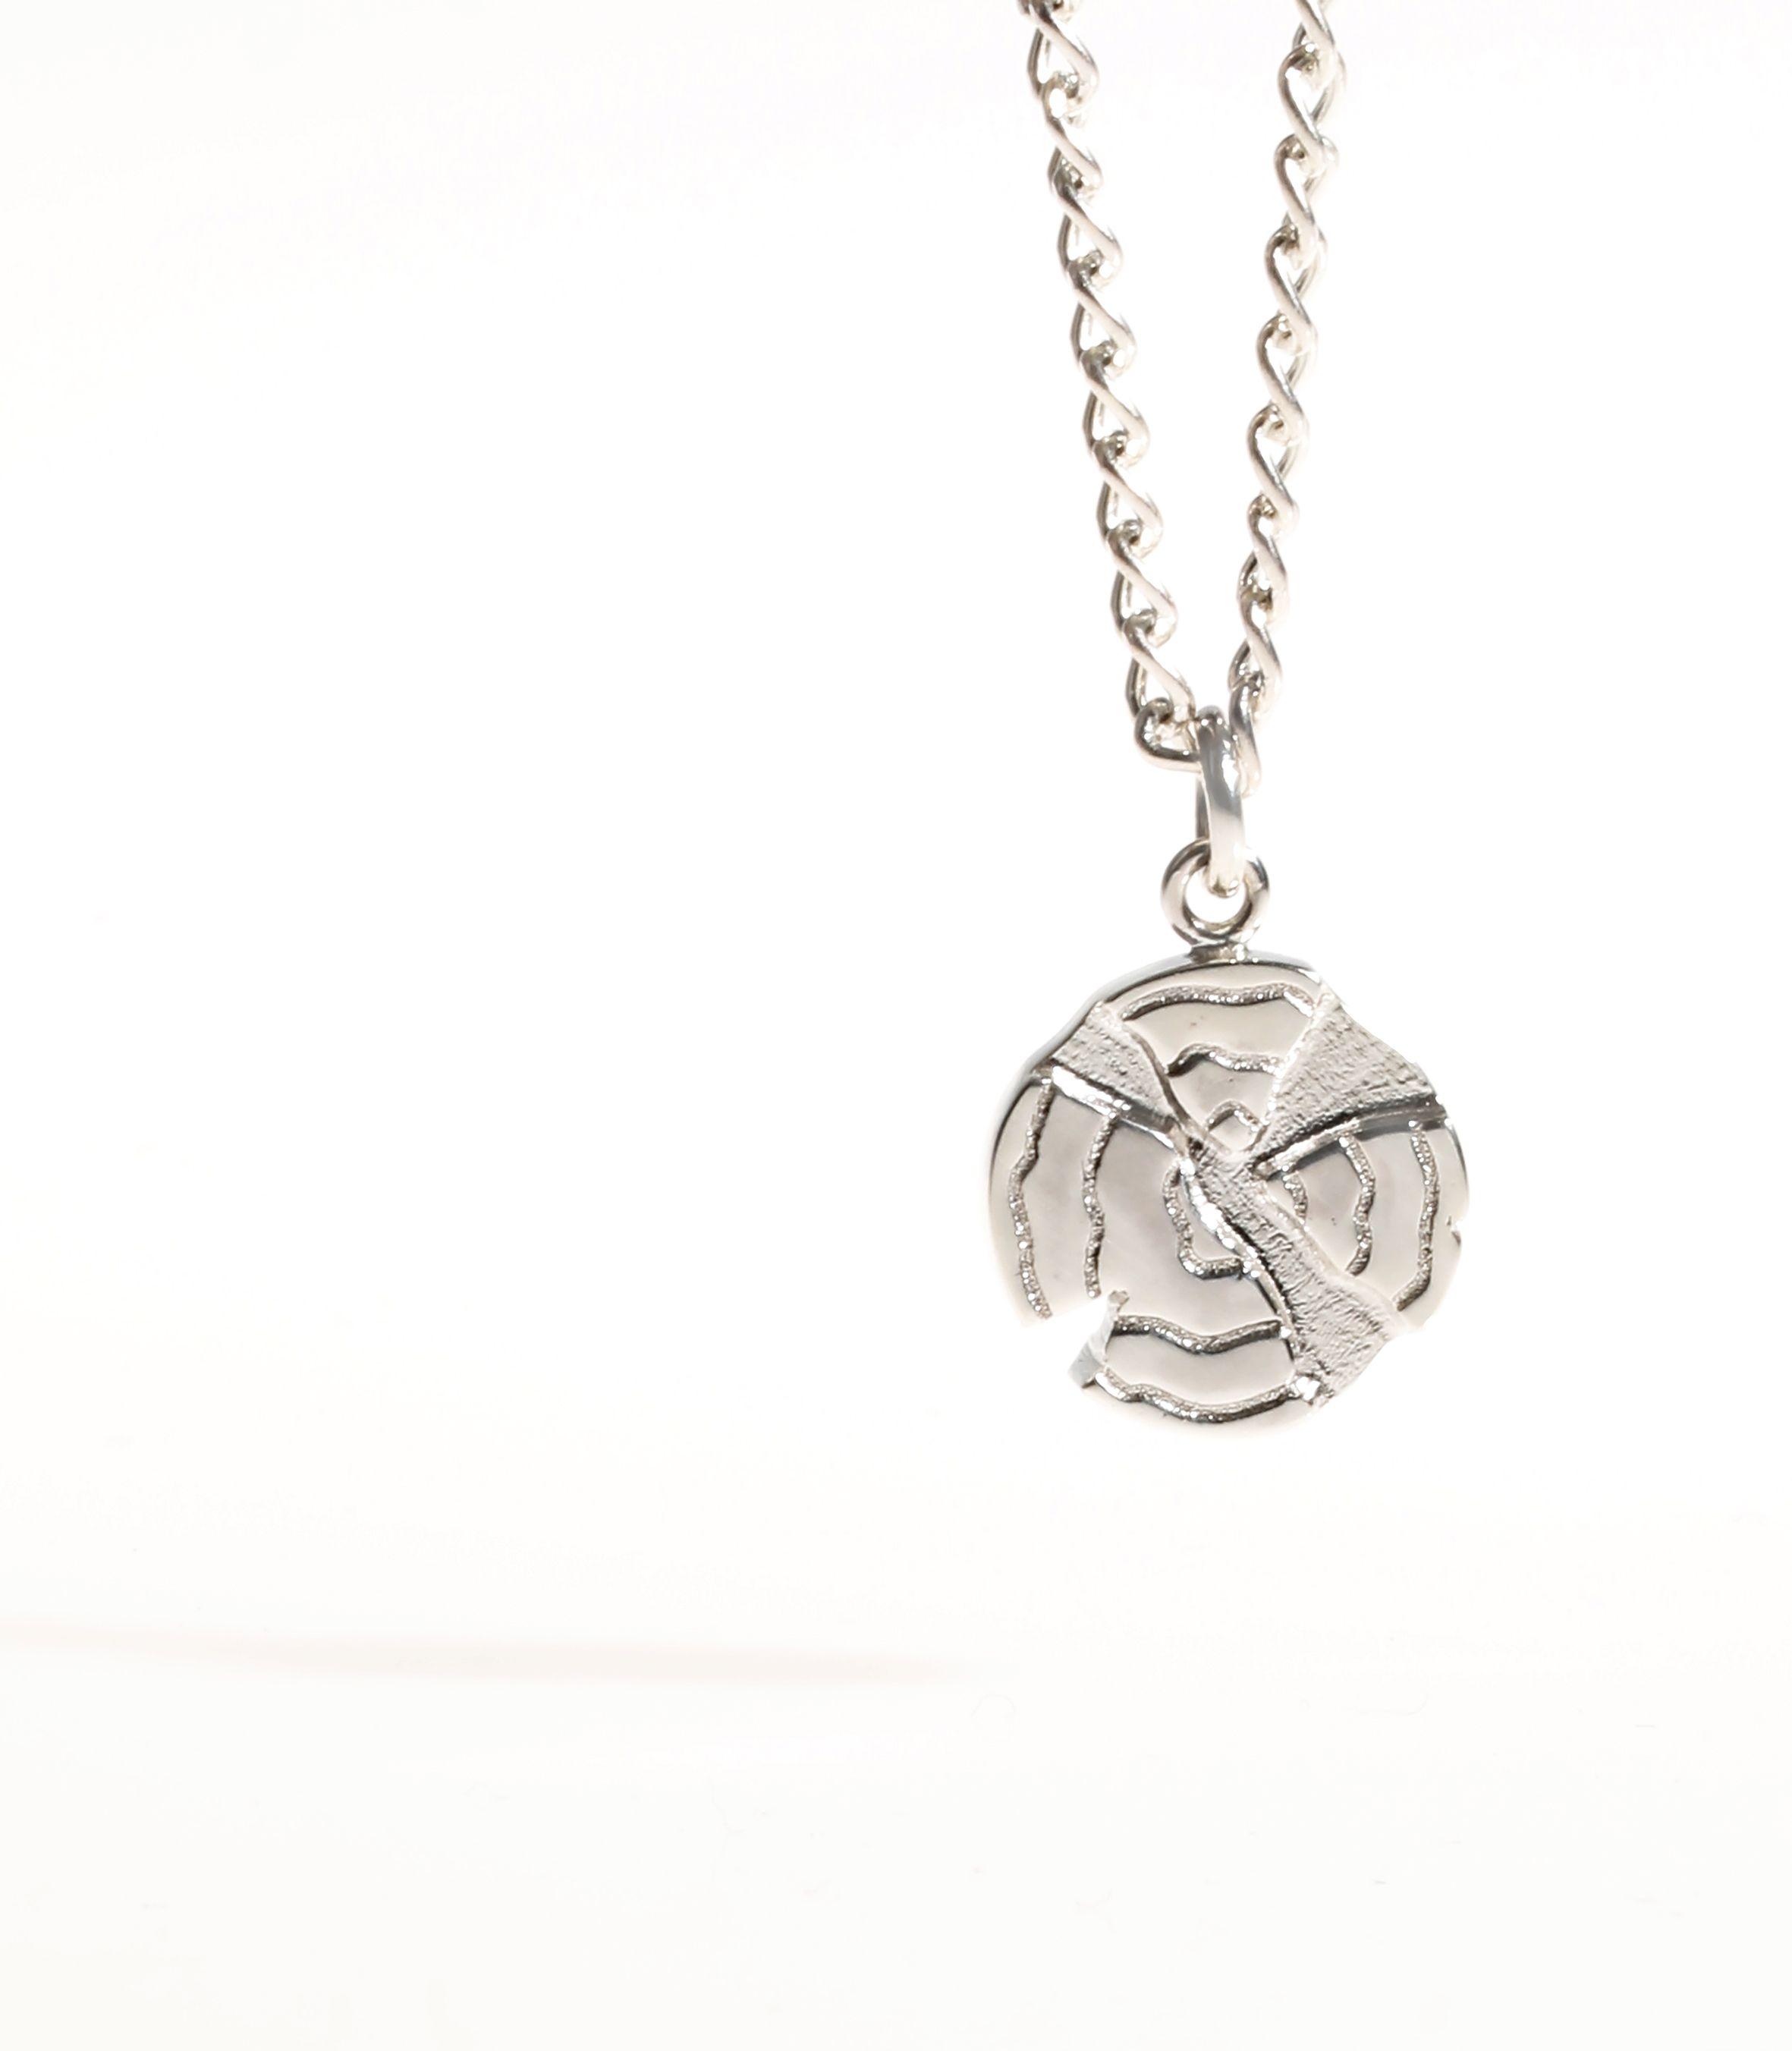 JK Frost Collection Mirka Laine Design jewelry design formen